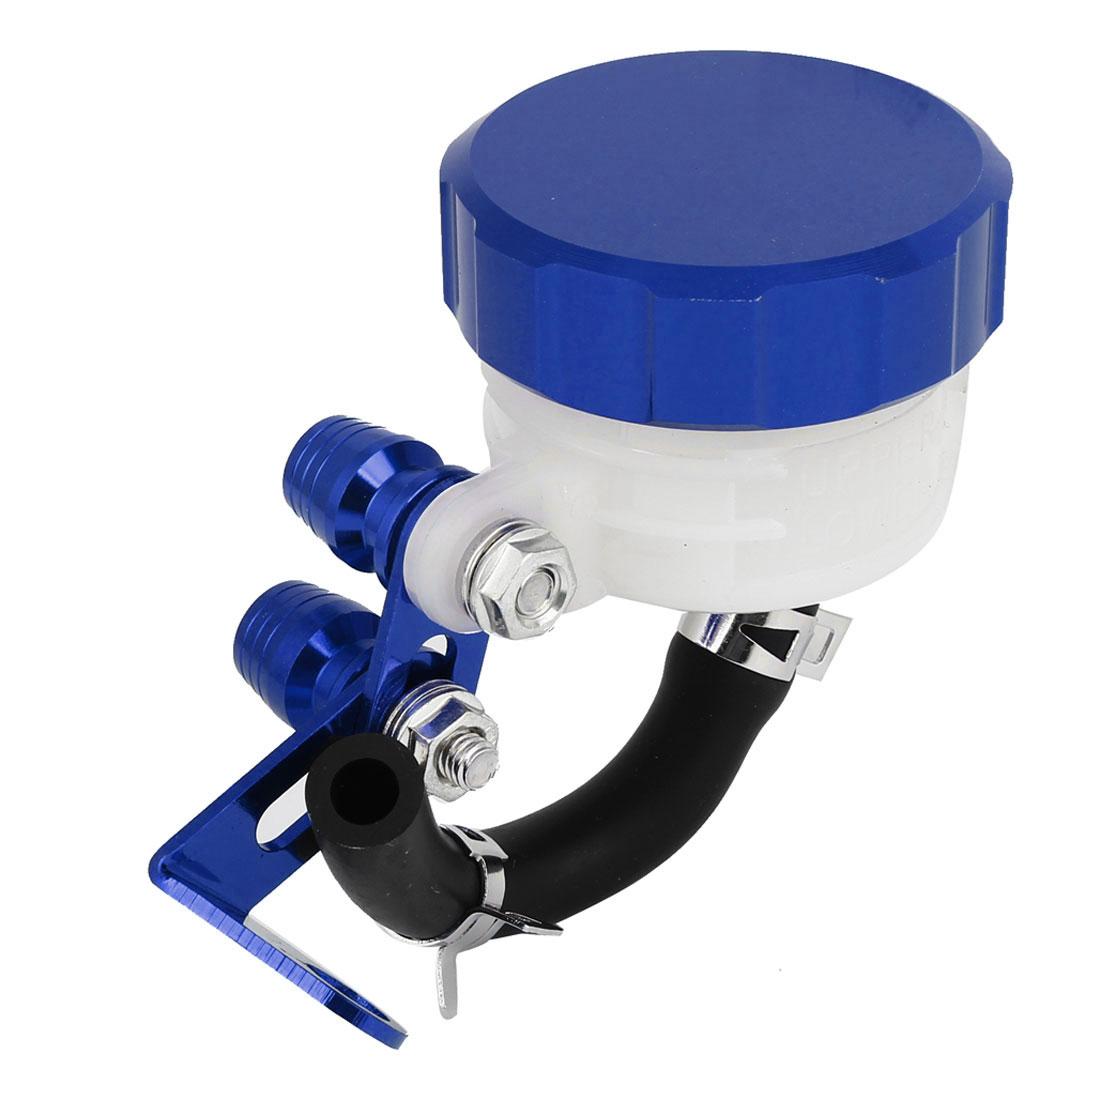 Blue Plastic Braking System Master Brake Reservoir Oil Cup for Motorbike